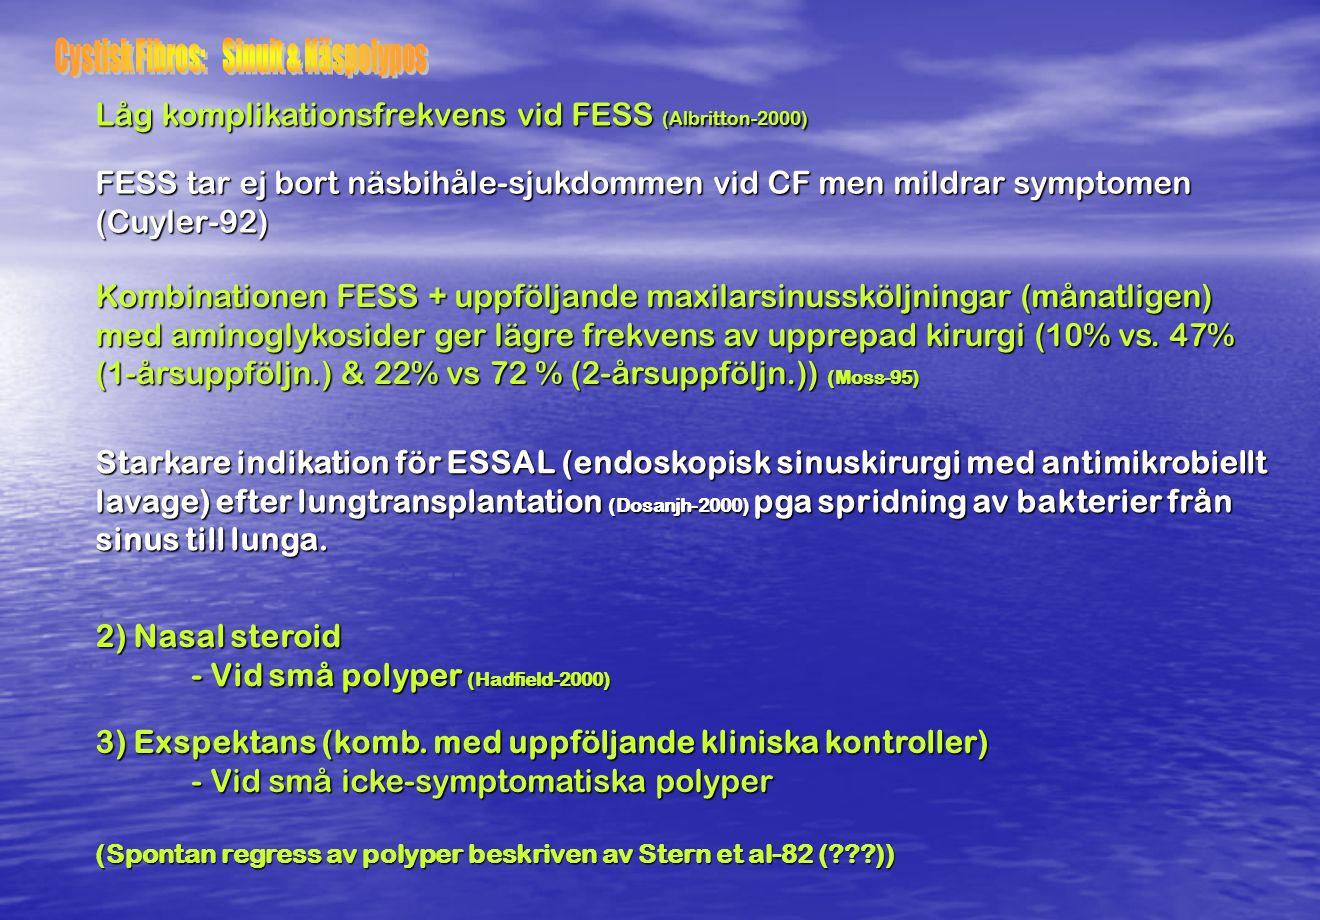 Cystisk Fibros: Sinuit & Näspolypos